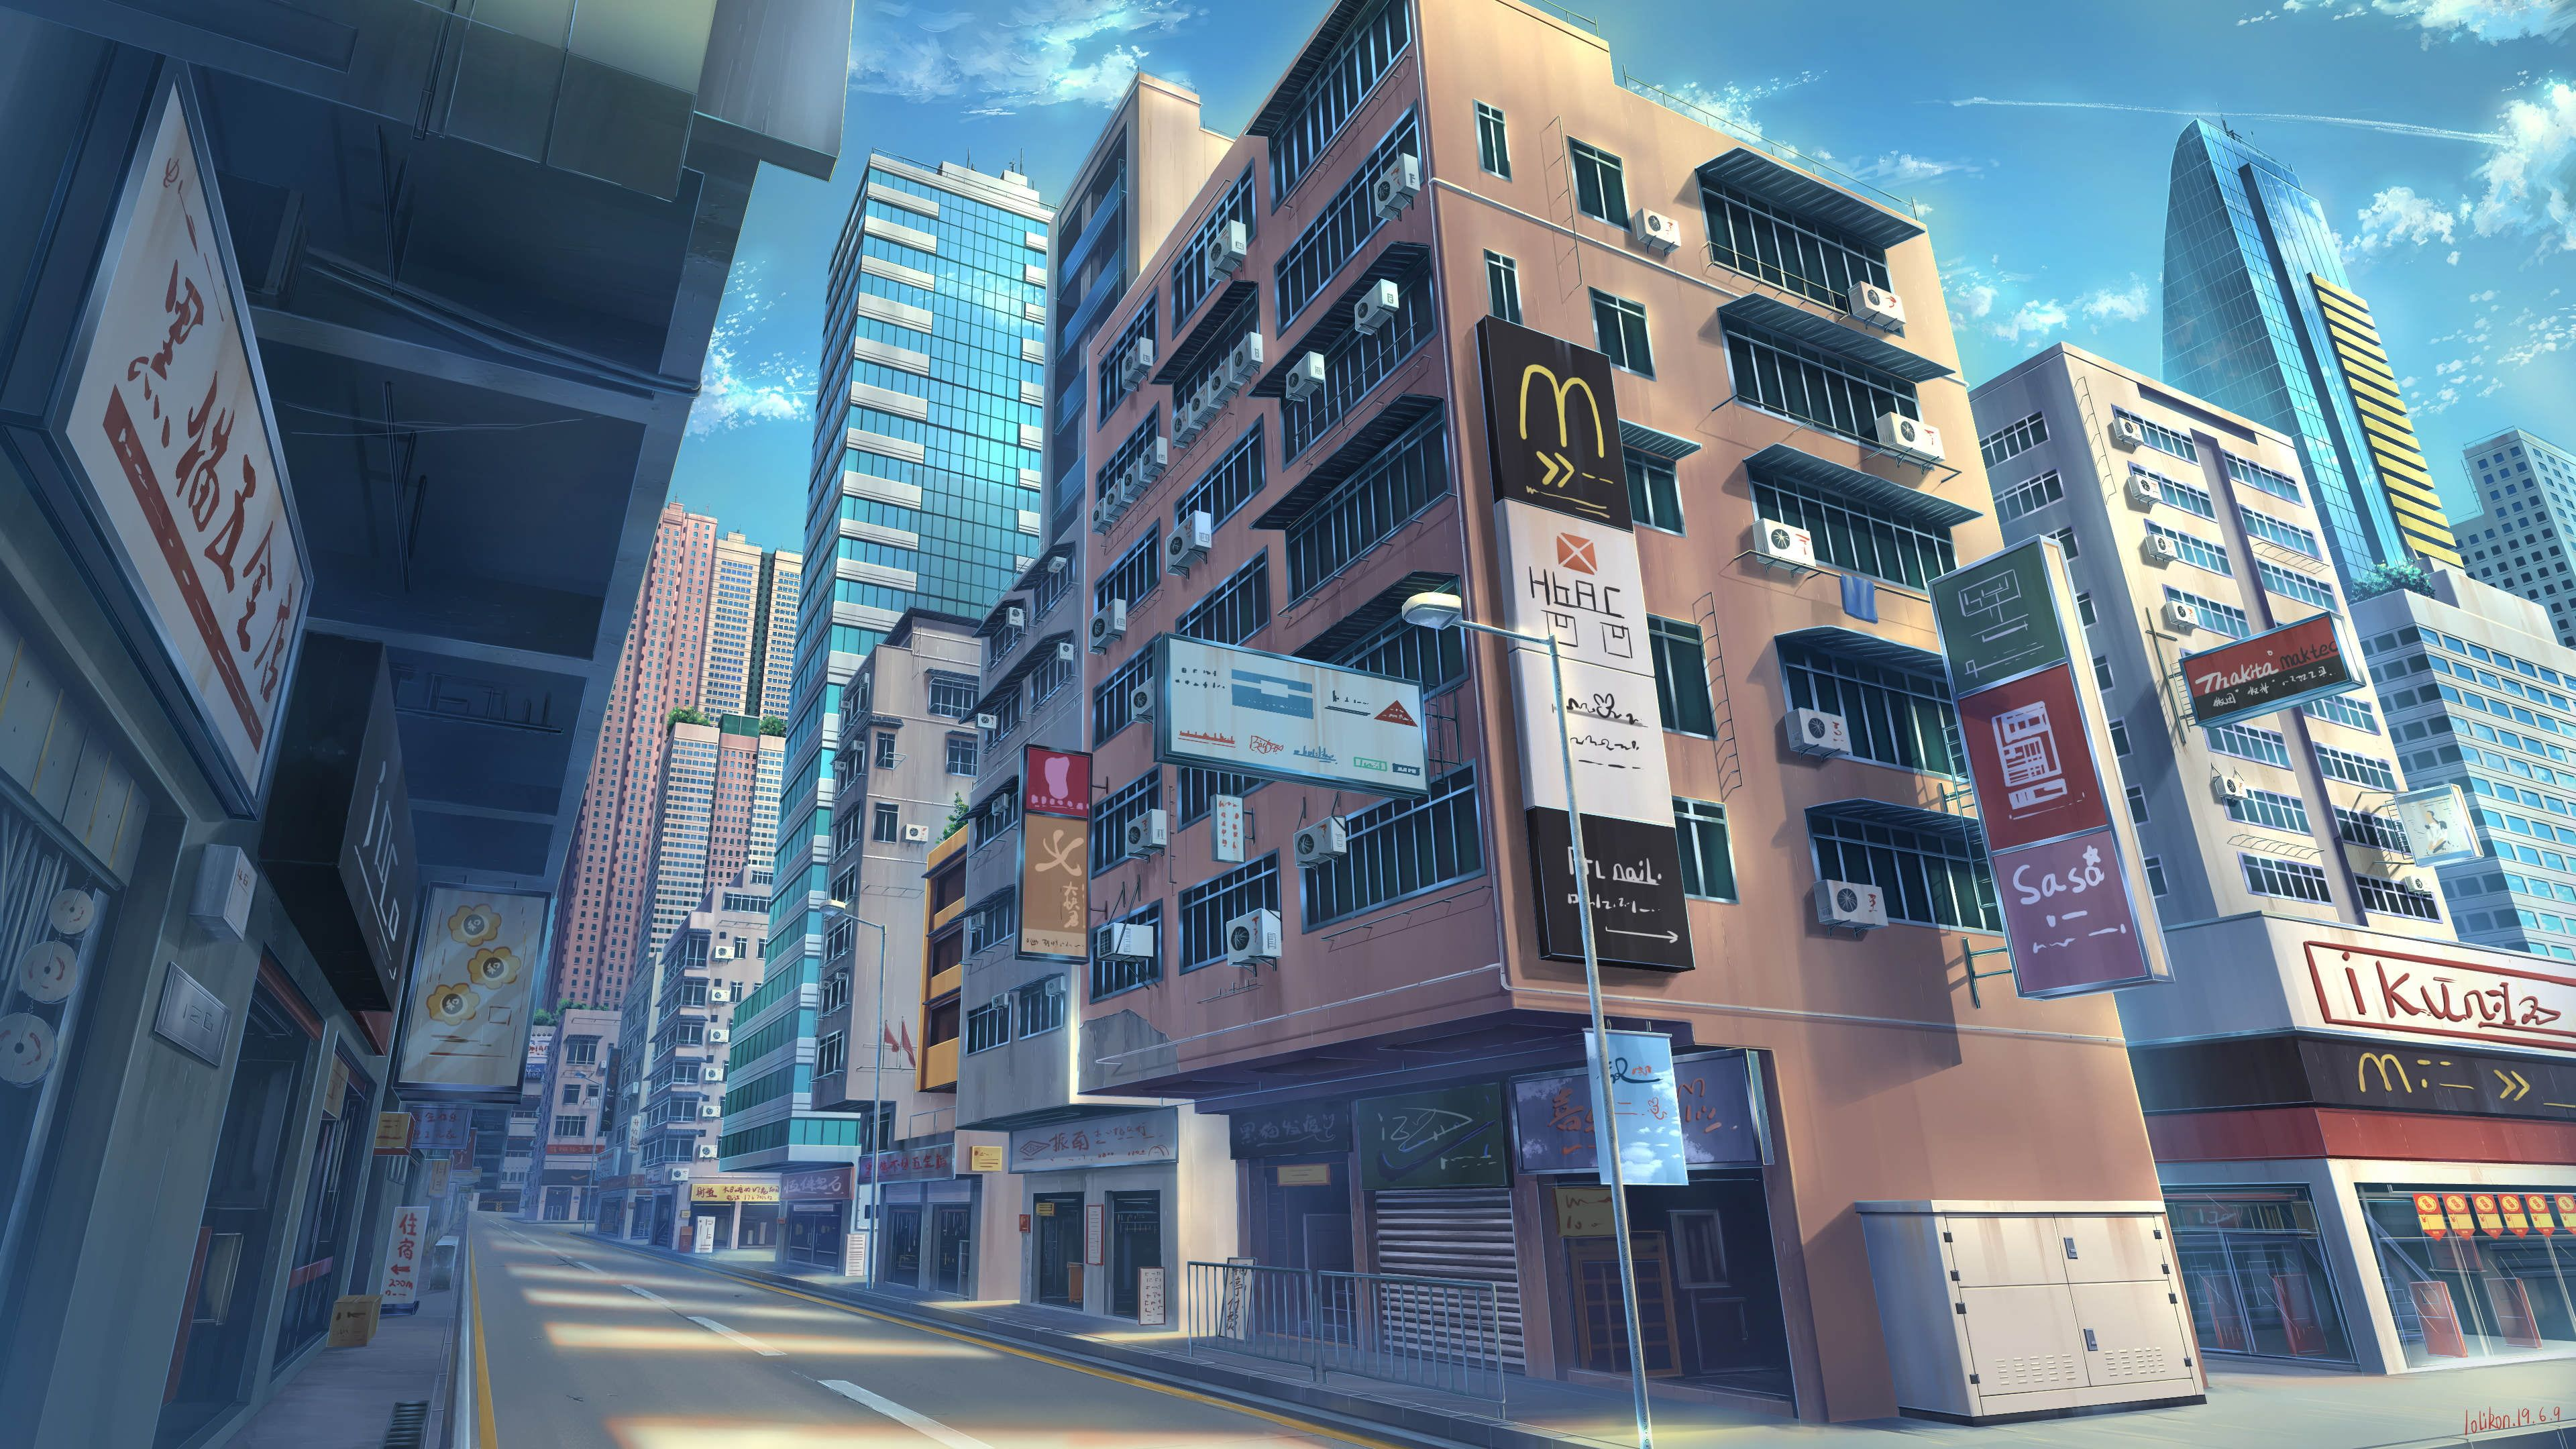 Anime Original Building City Original Anime Street 4k Wallpaper Hdwallpaper Desktop Anime City Anime City Wallpaper Anime Street Wallpaper